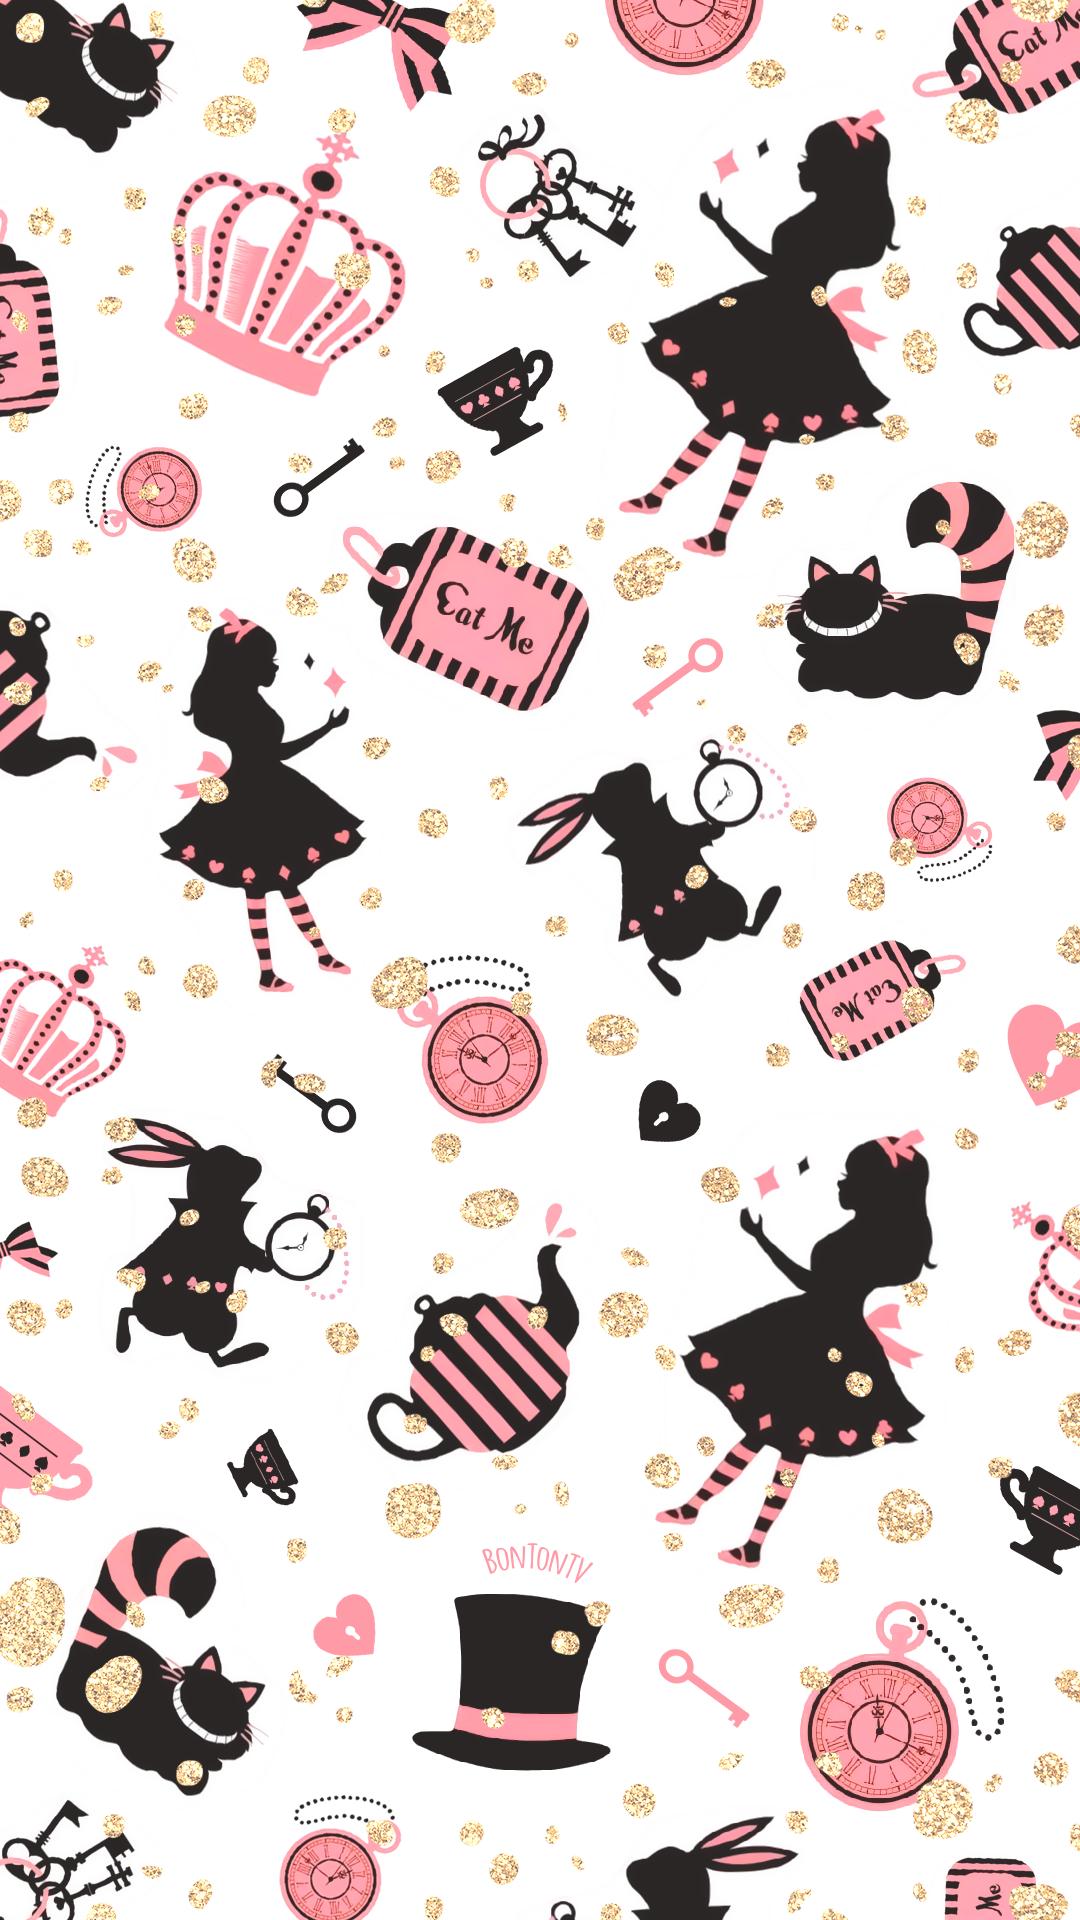 Phone Wallpapers Hd From Bonton Tv Free Download 1080x1920 Wallpapers In 2020 Alice In Wonderland Background Alice In Wonderland Pictures Cute Disney Wallpaper